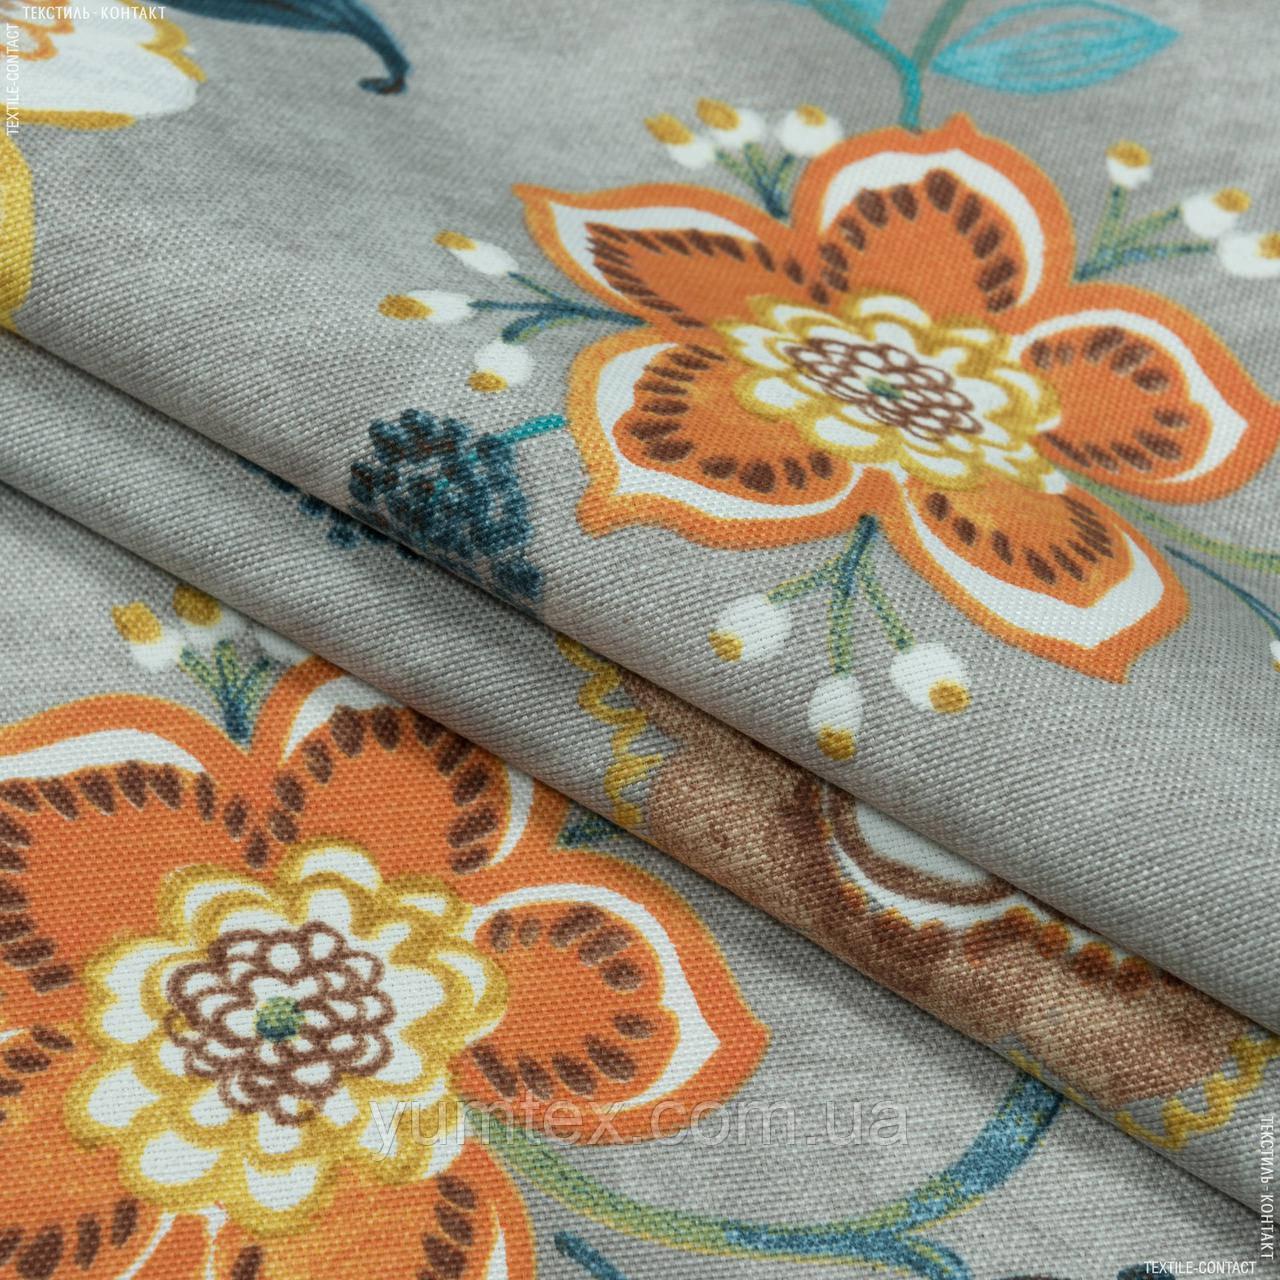 Декоративная ткань  панама хеви/panama hevia цветы,фон серый 148942